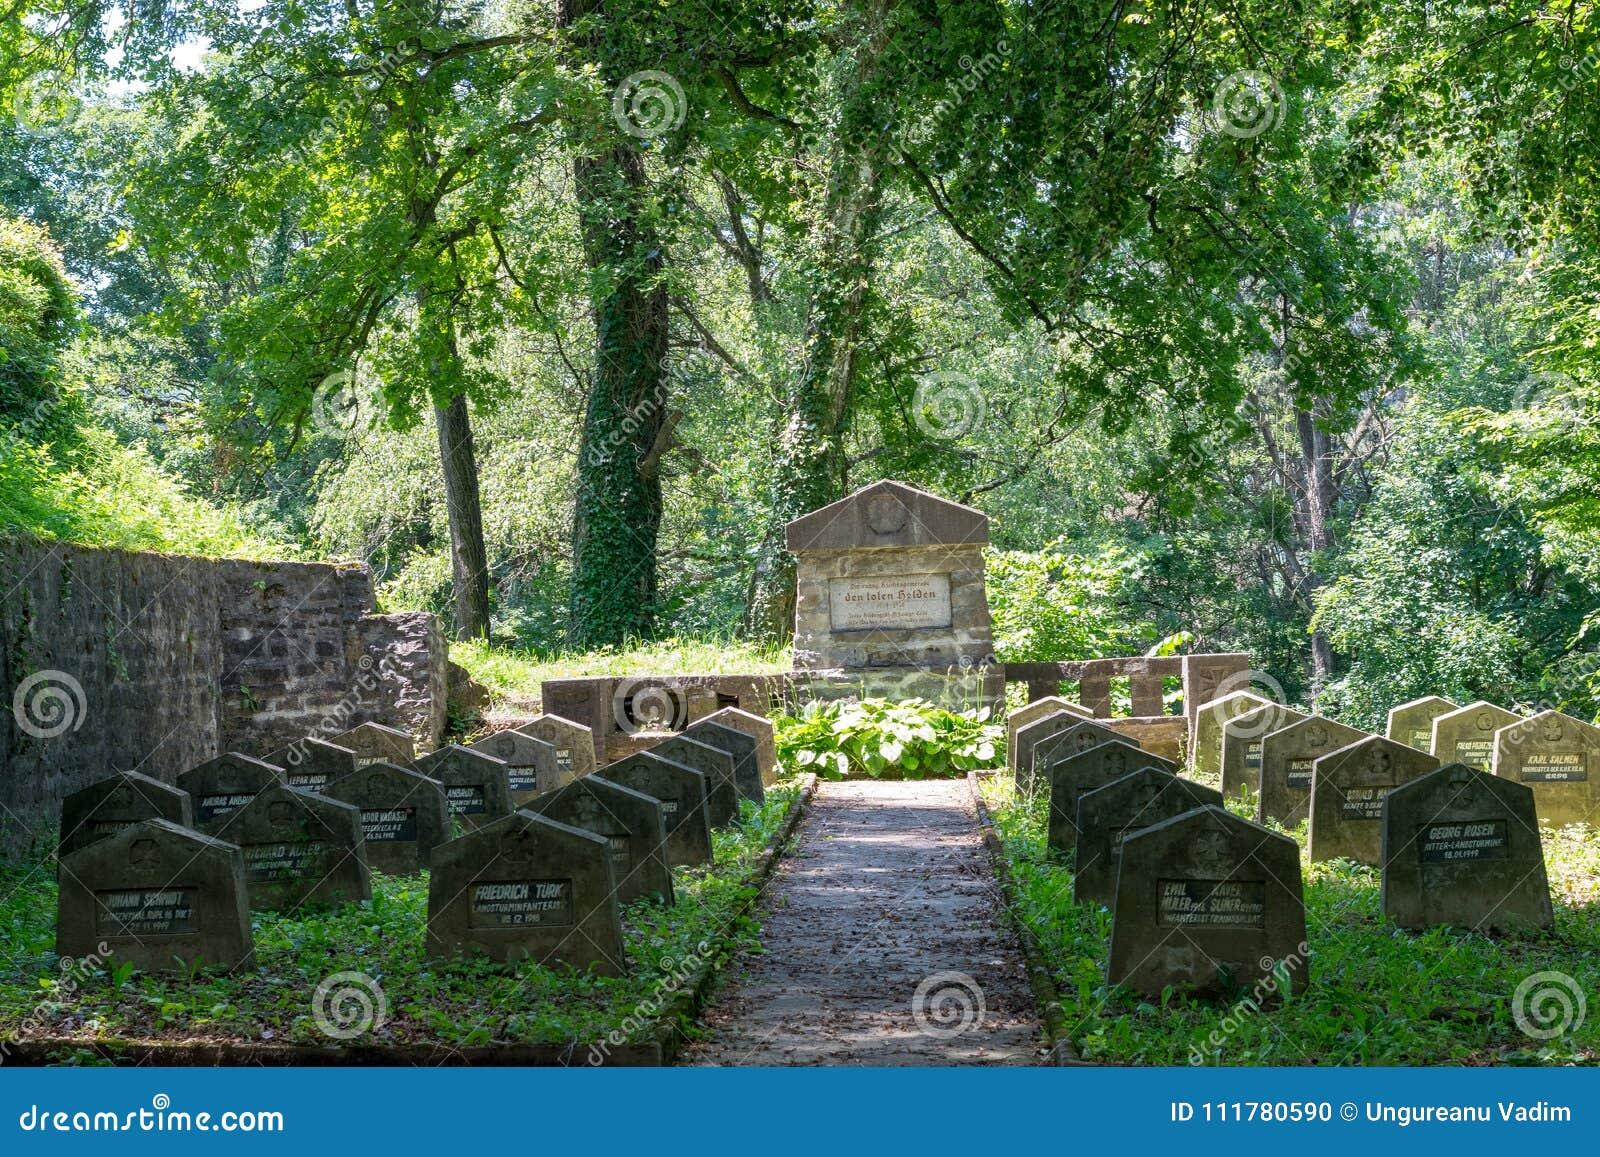 SIGHISOARA, RUMÄNIEN - 1. JULI 2016: WWI-Kirchhof, nahe dem sächsischen Kirchhof, gelegen nahe bei der Kirche auf dem Hügel in Si